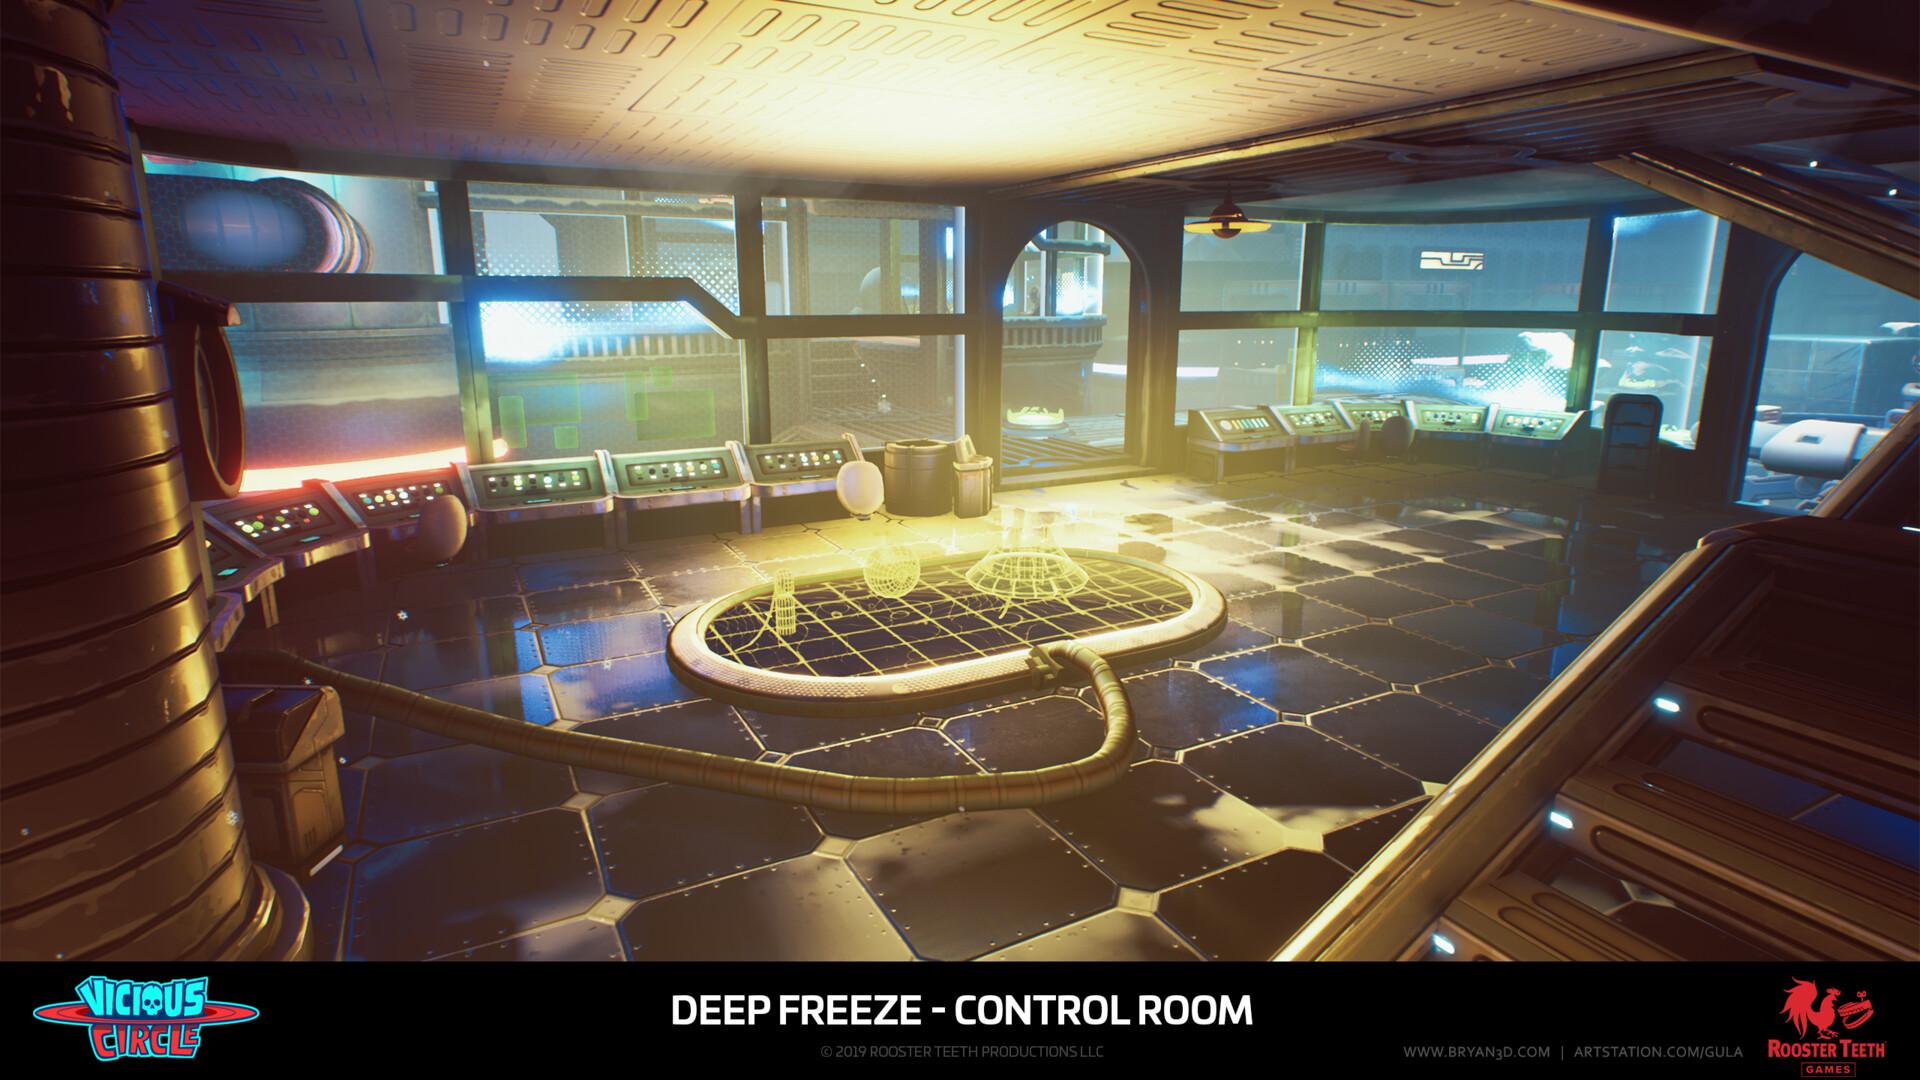 Bryan shannon 002 deepfreezecontrolroom